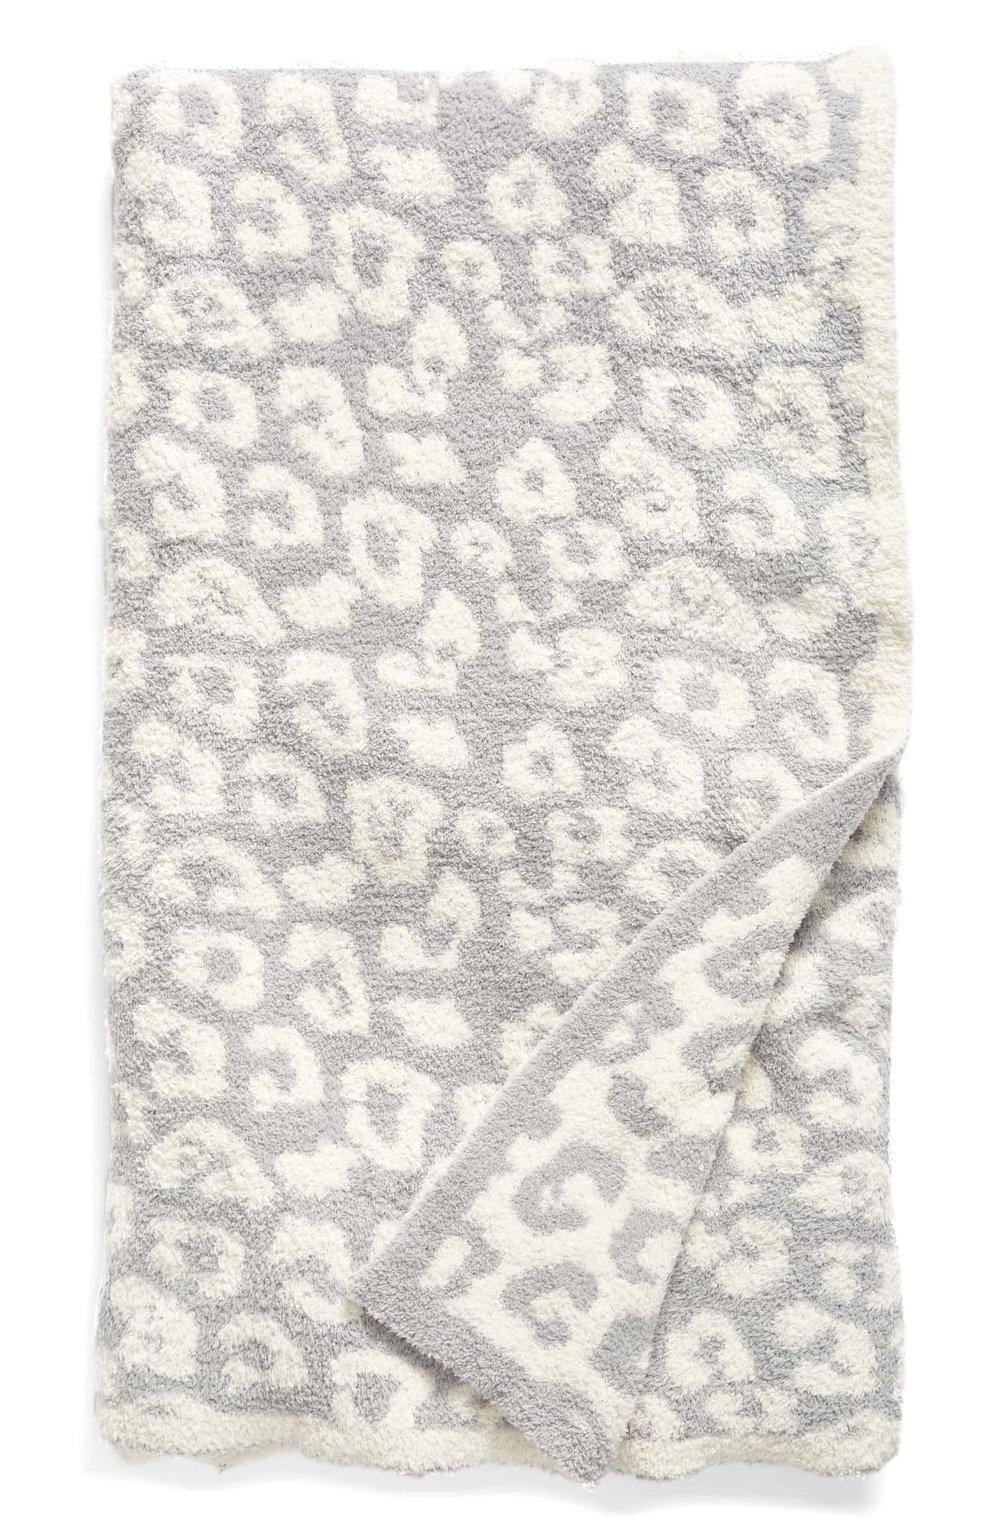 FUZZY BLANKET - LOVE Barefoot Dreams! LOVE cheetah print!